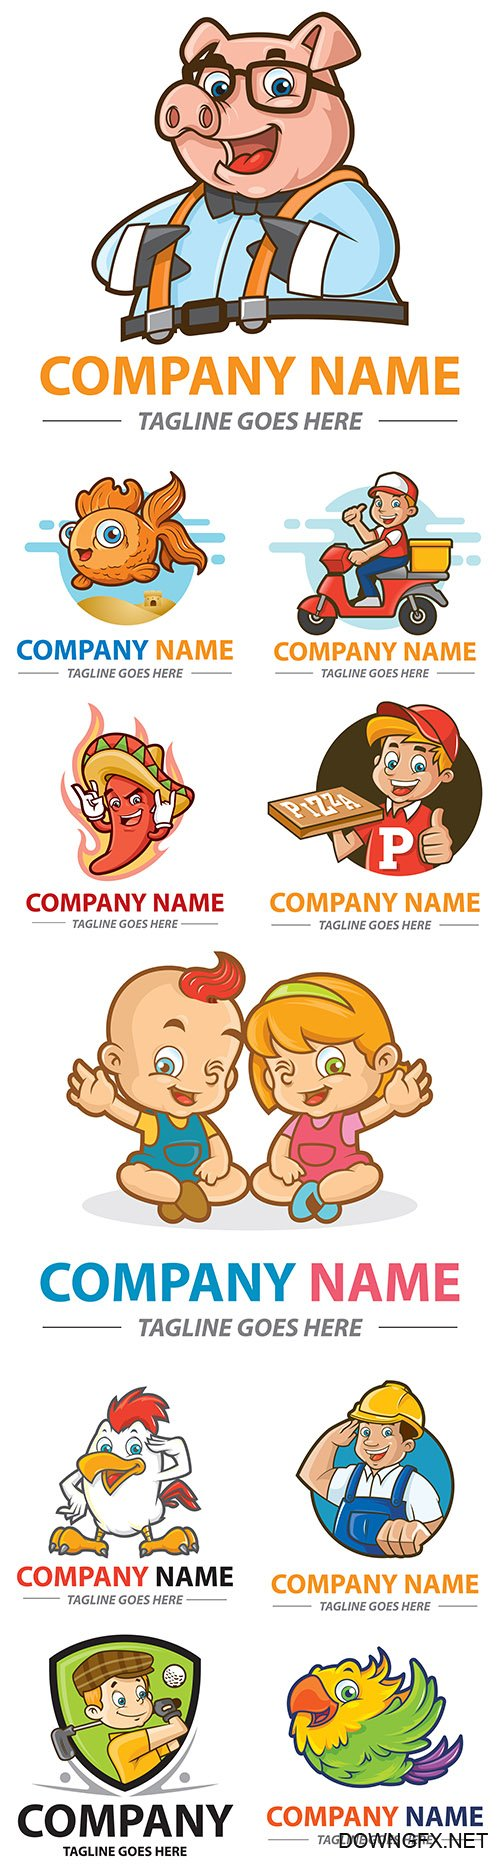 Brand name company logos business corporate design 4